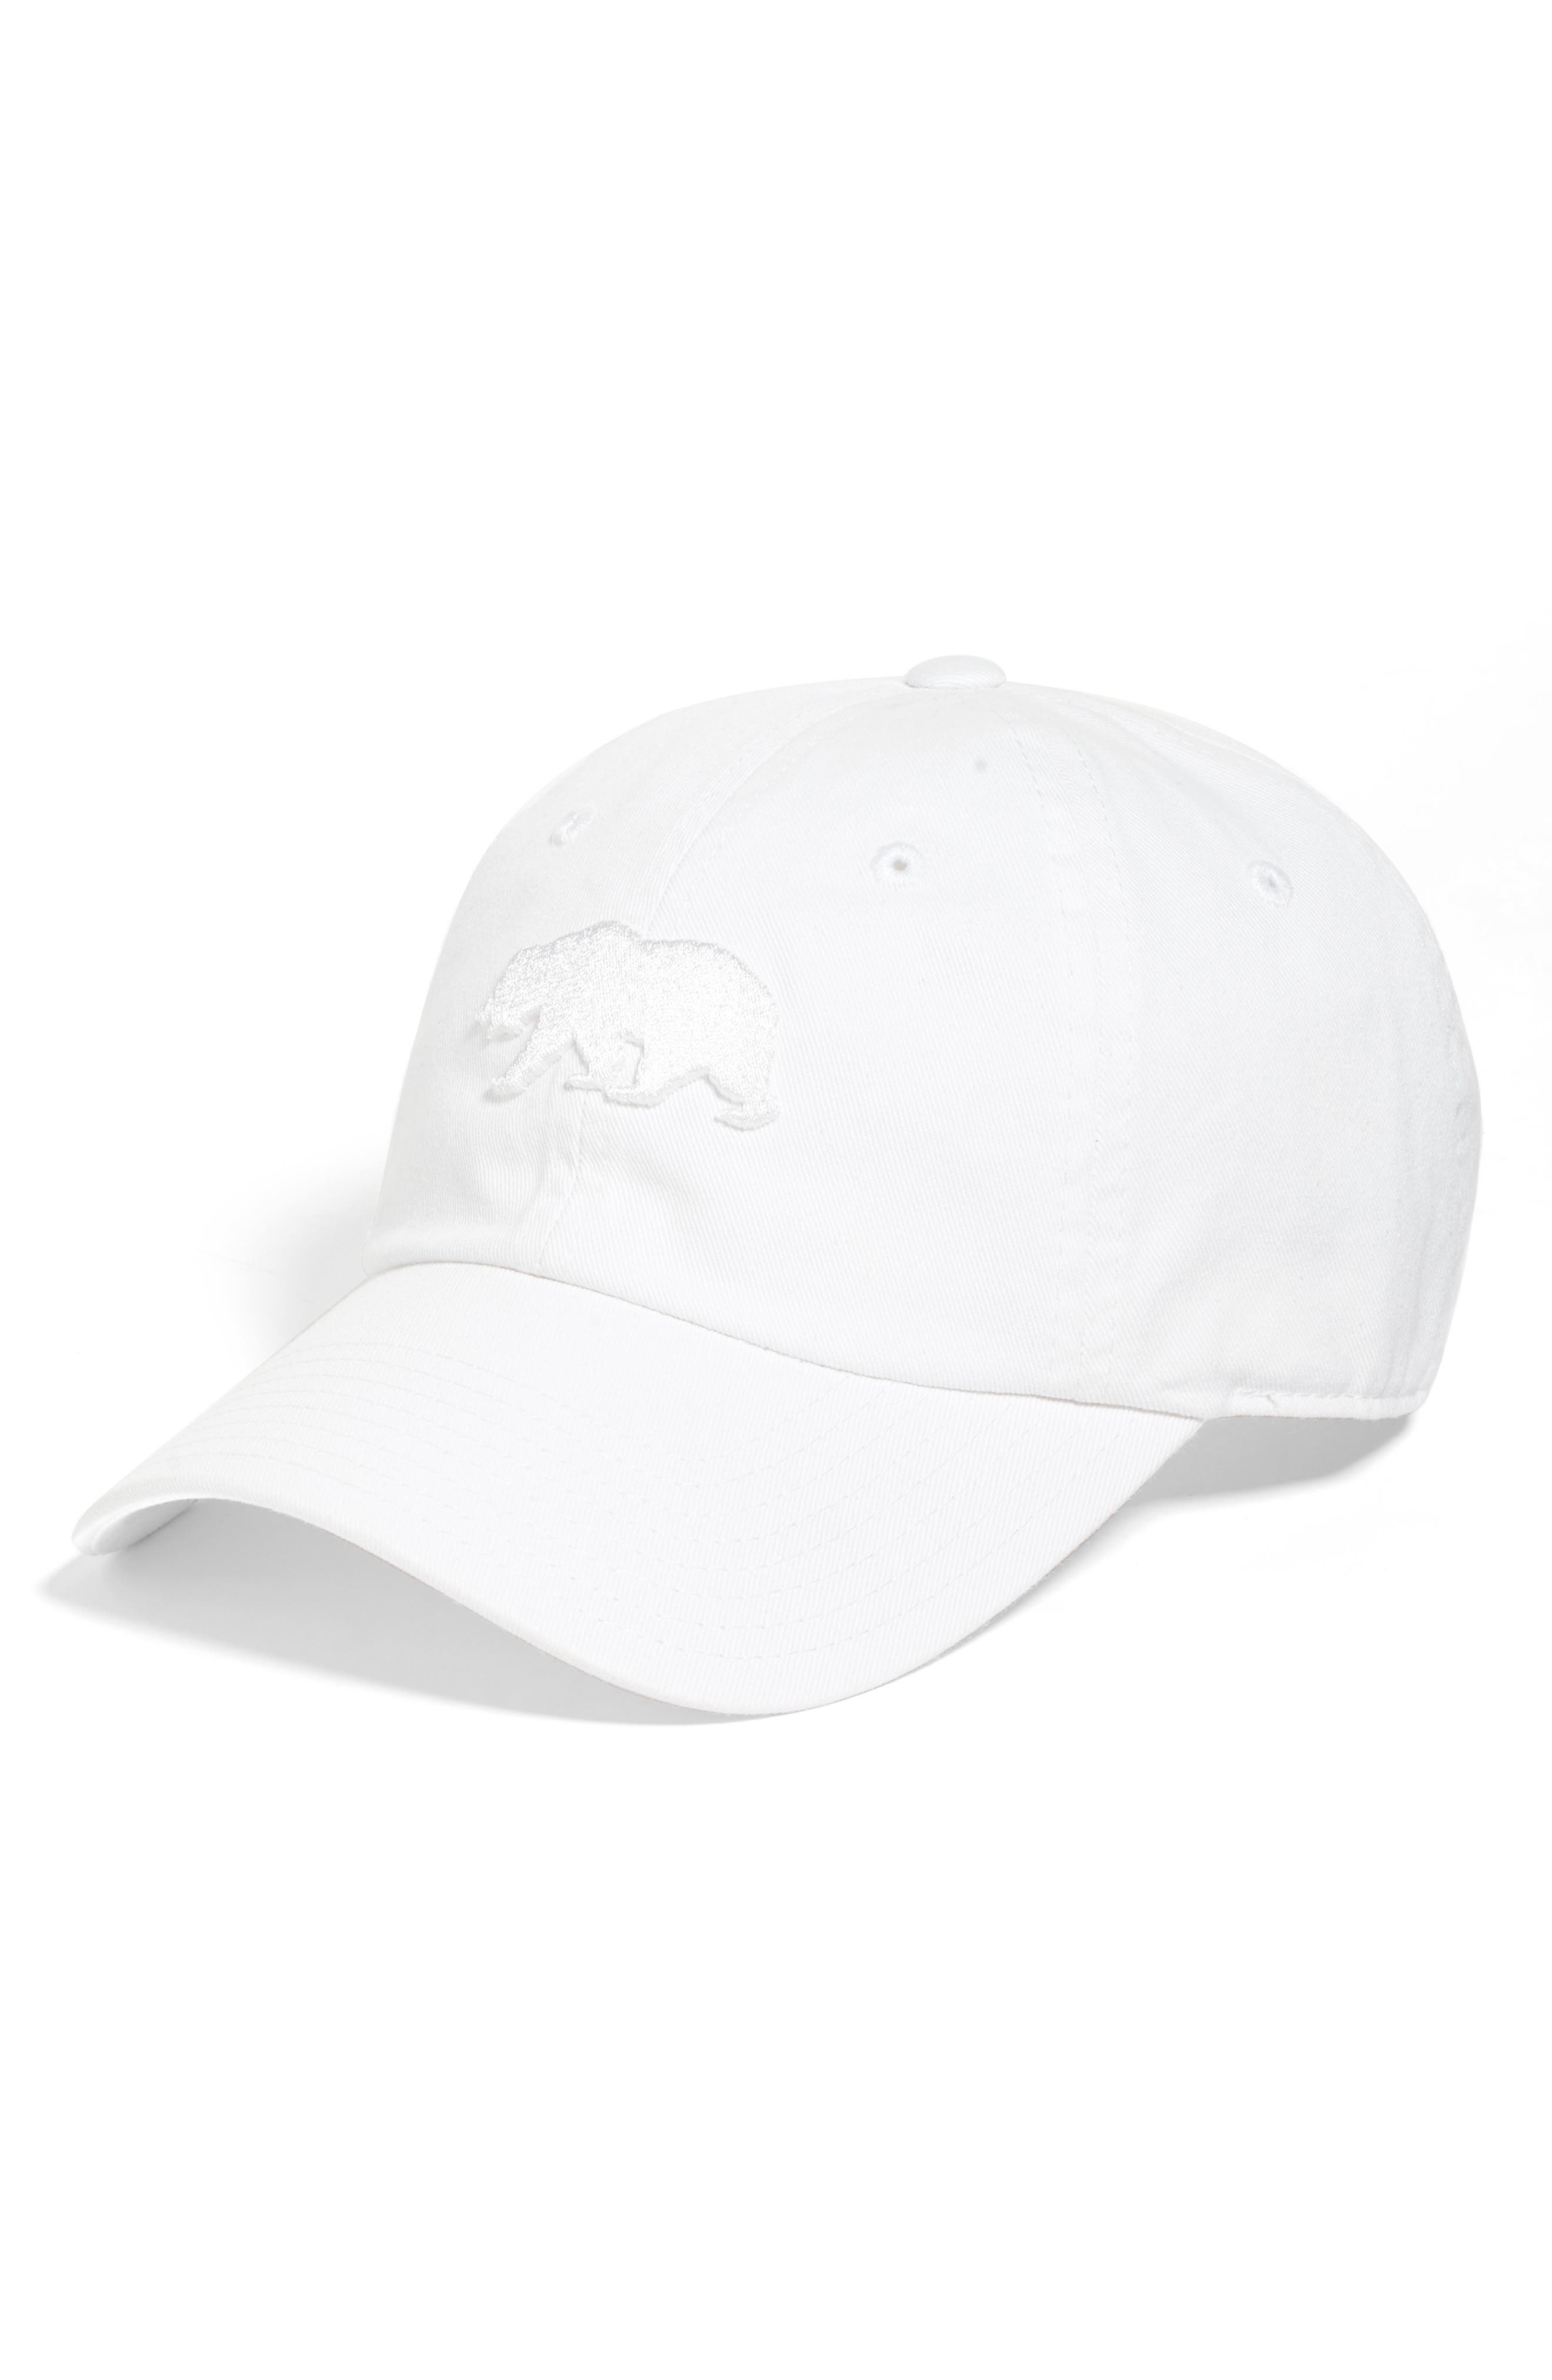 Cali Baseball Cap,                         Main,                         color, Snow White